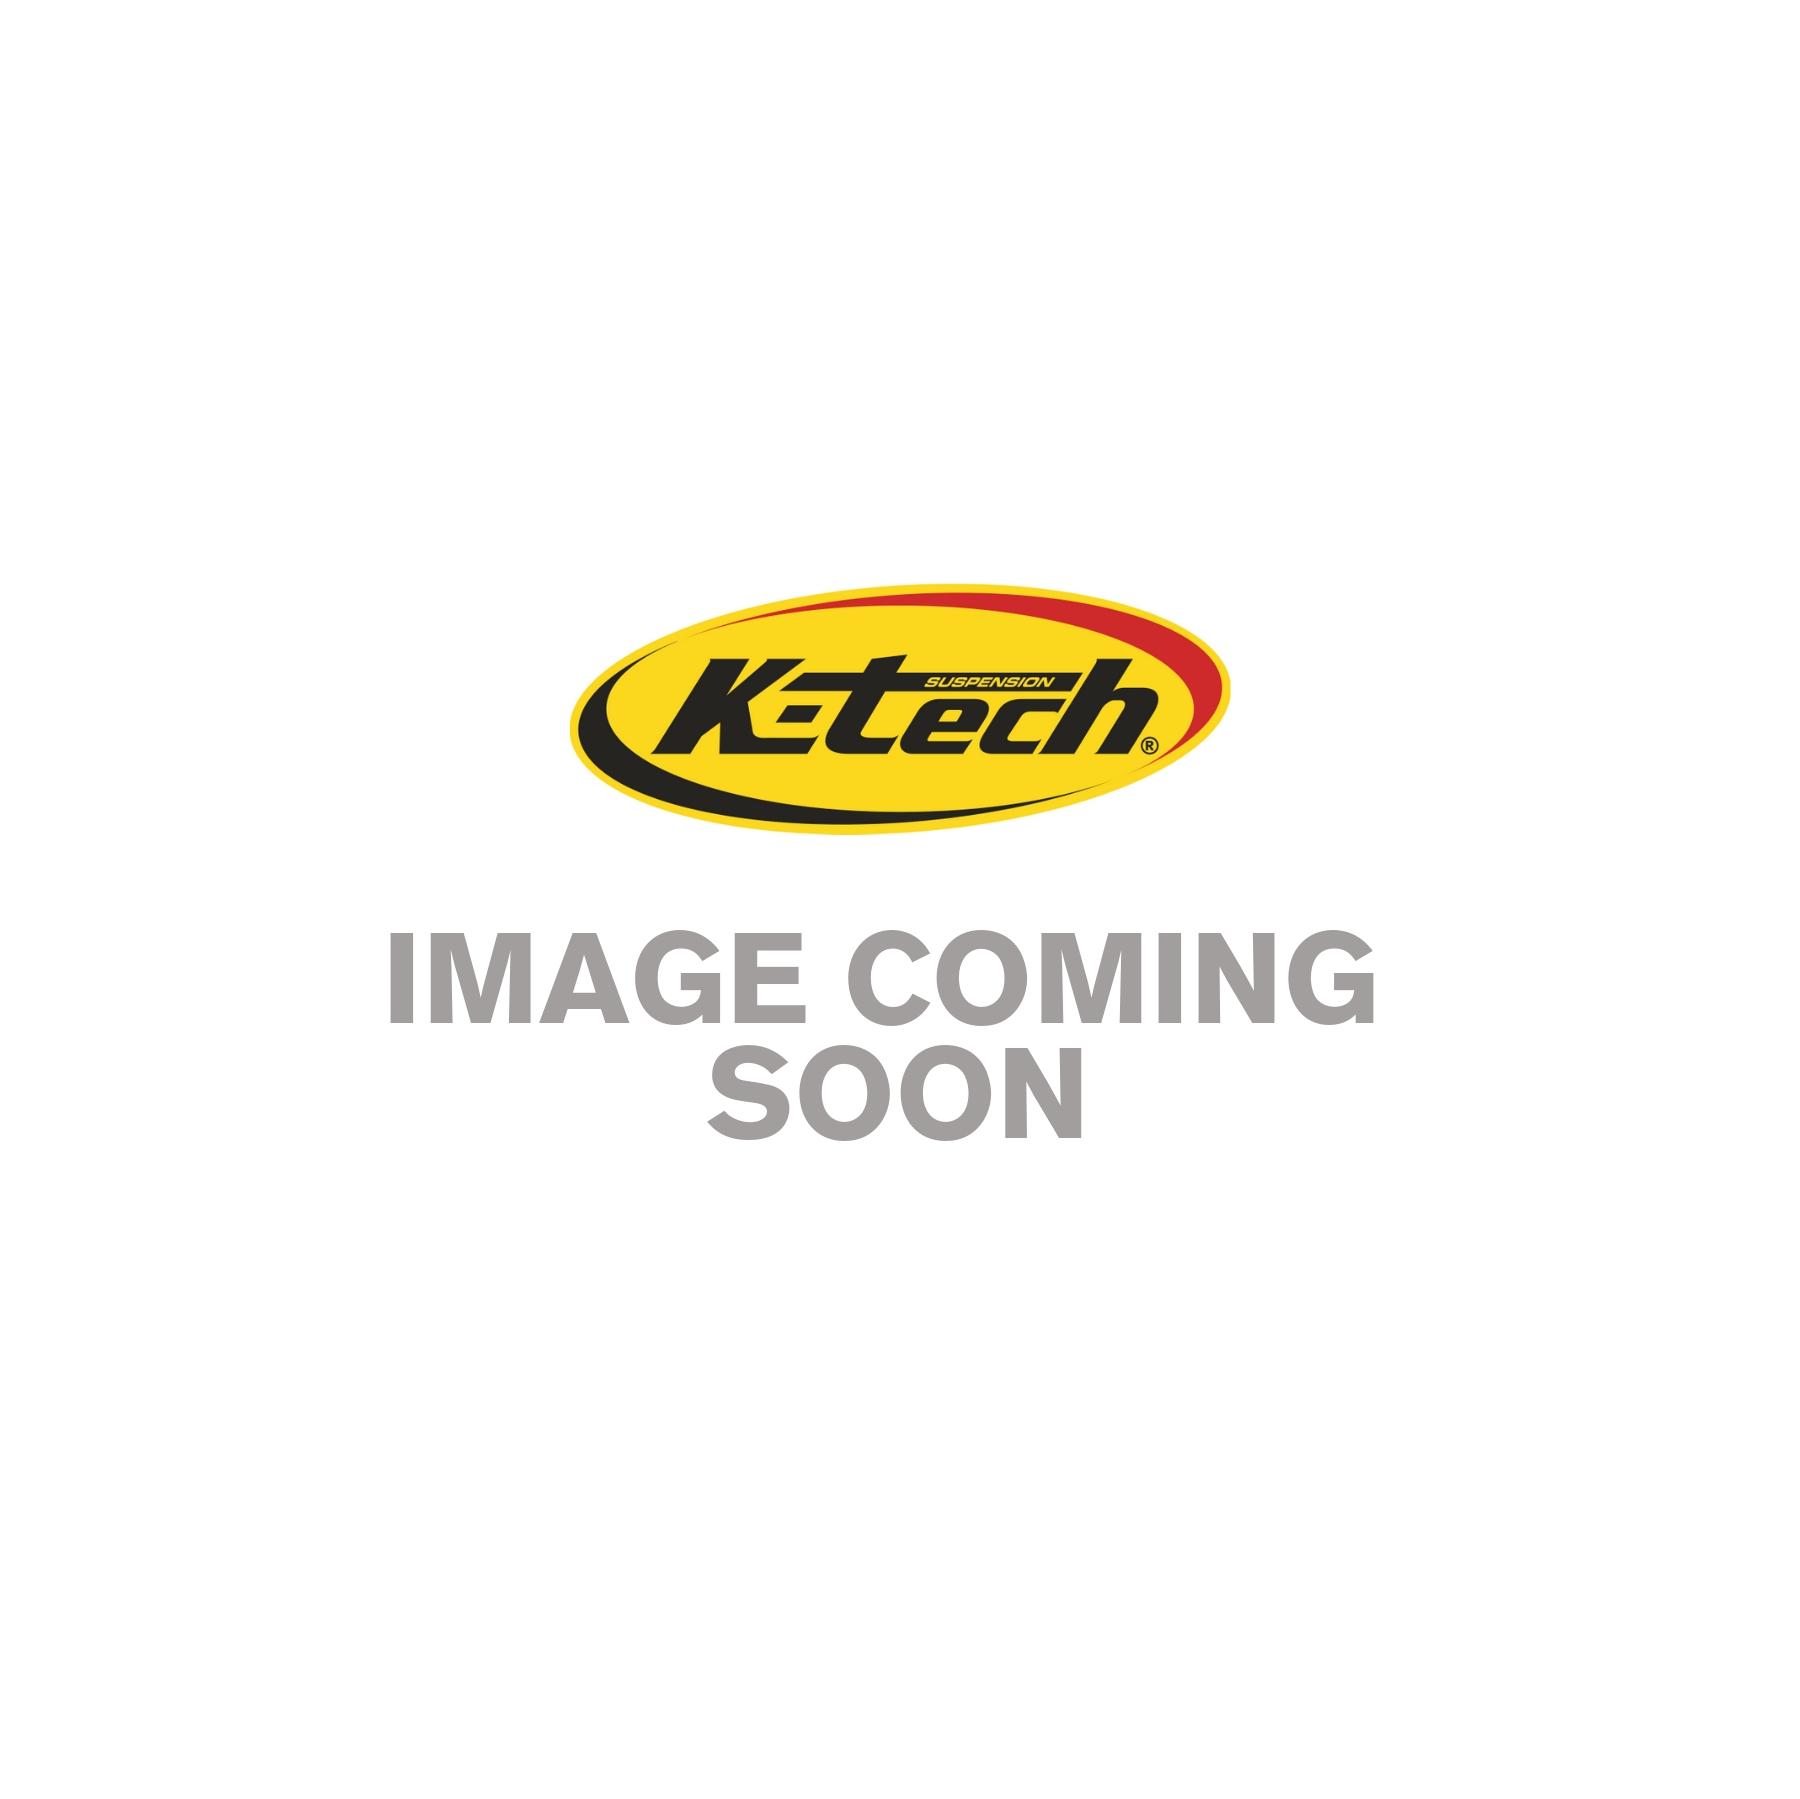 SHOCK ABSORBER OIL K-TECH HIGH PERFORMANCE SAE 2.5w (20 ltr)